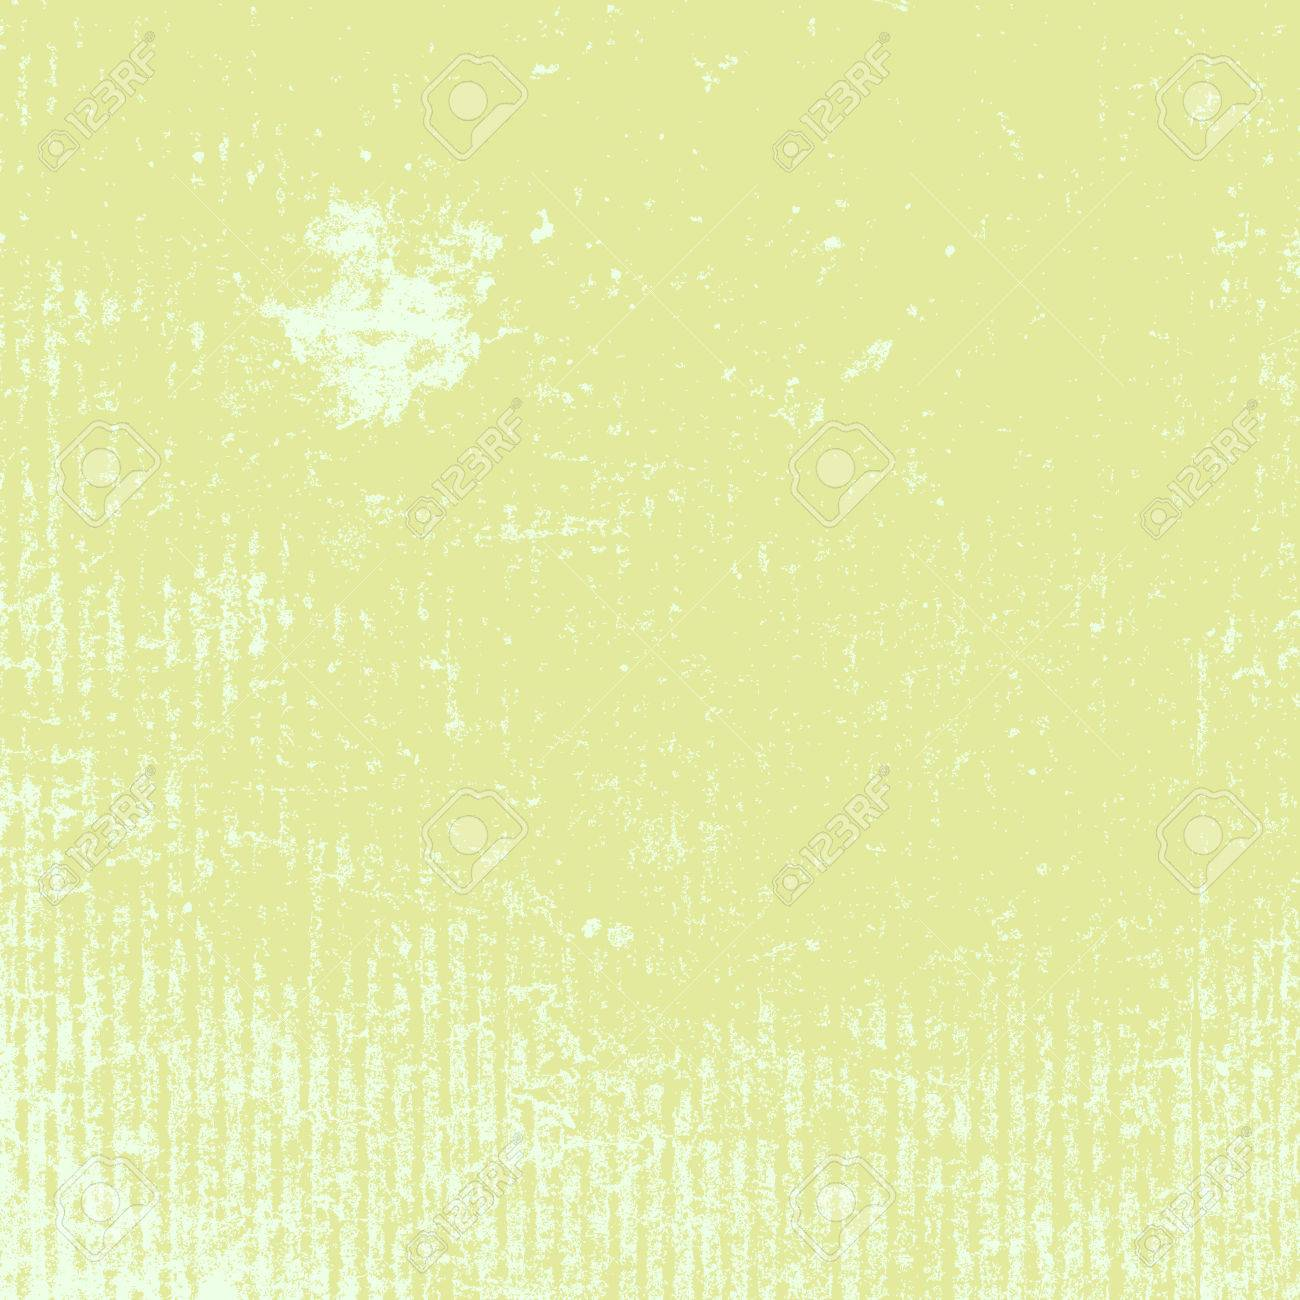 Dirty Color Cardboard - 40808332